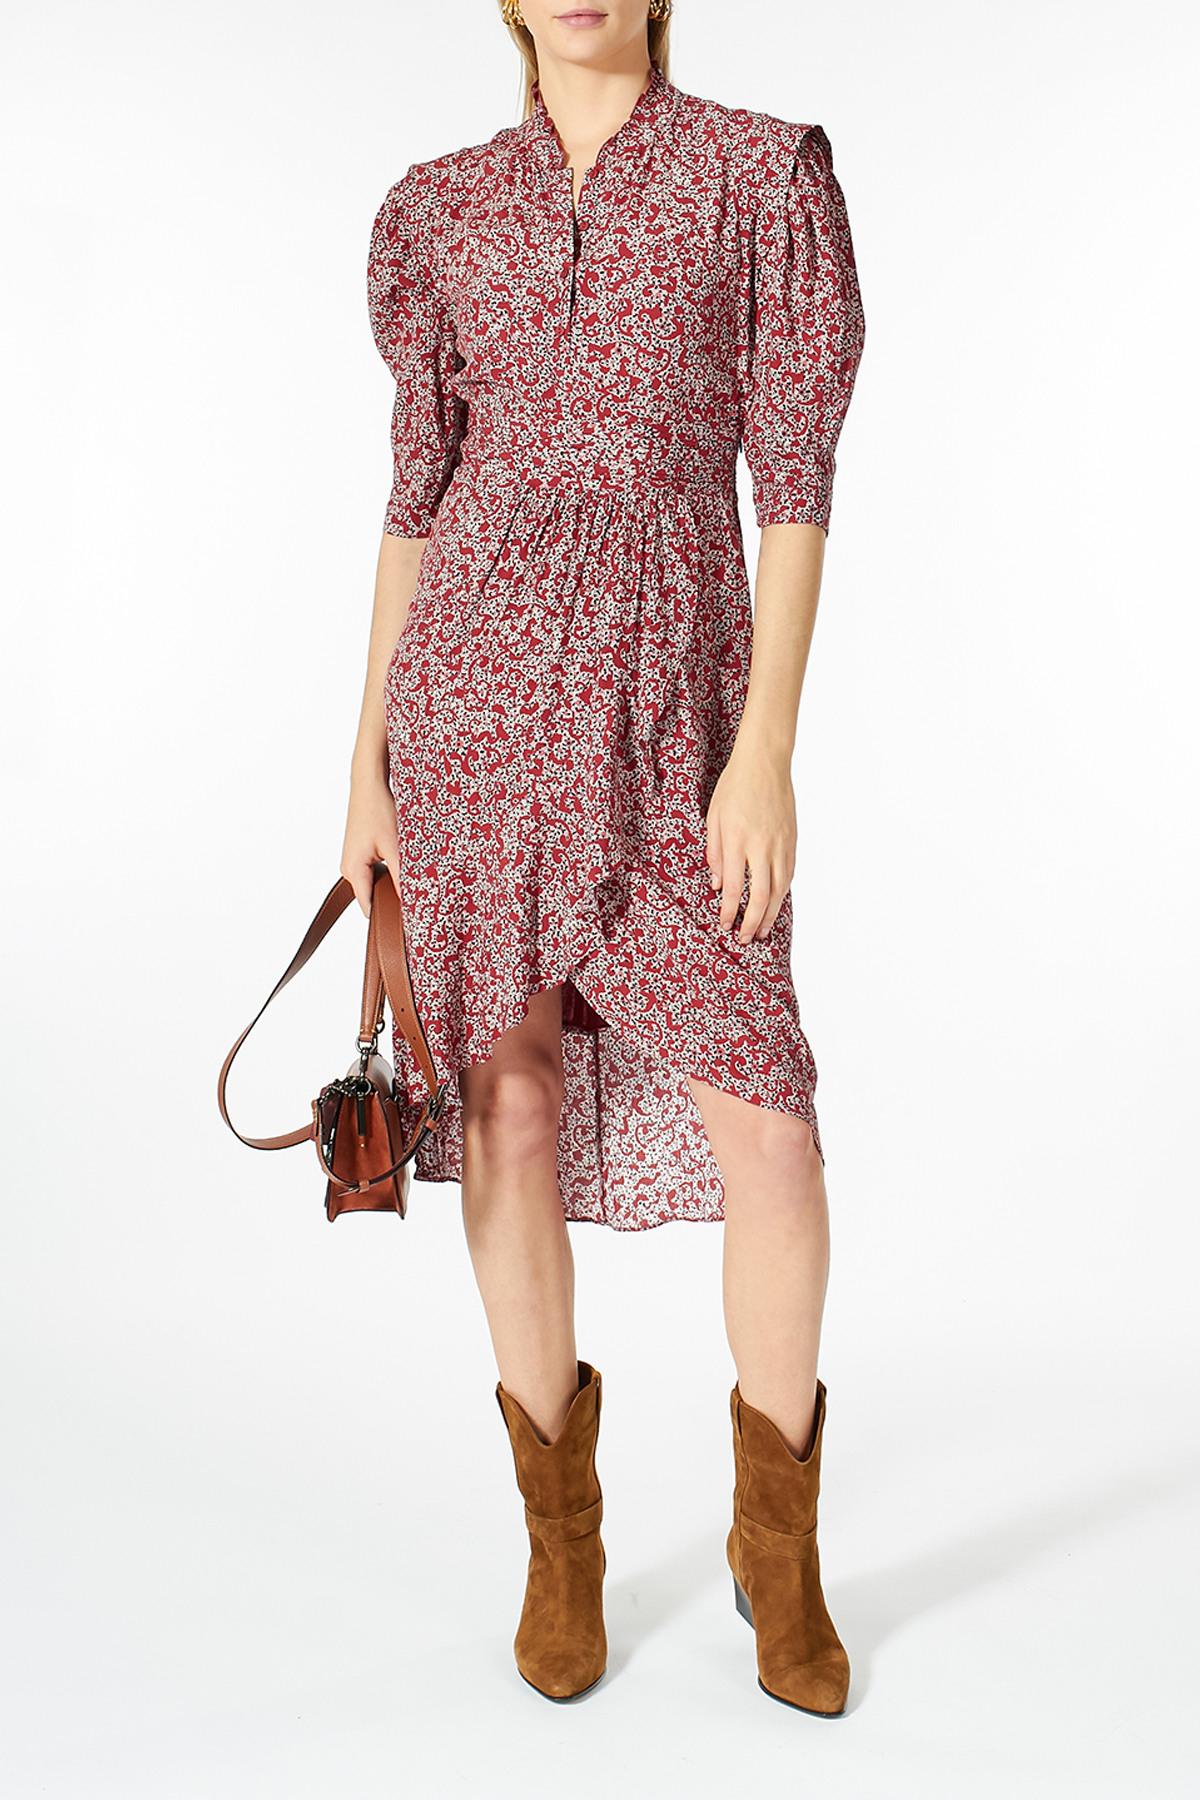 Kleid Aus Viskose  Bash  Myclassico